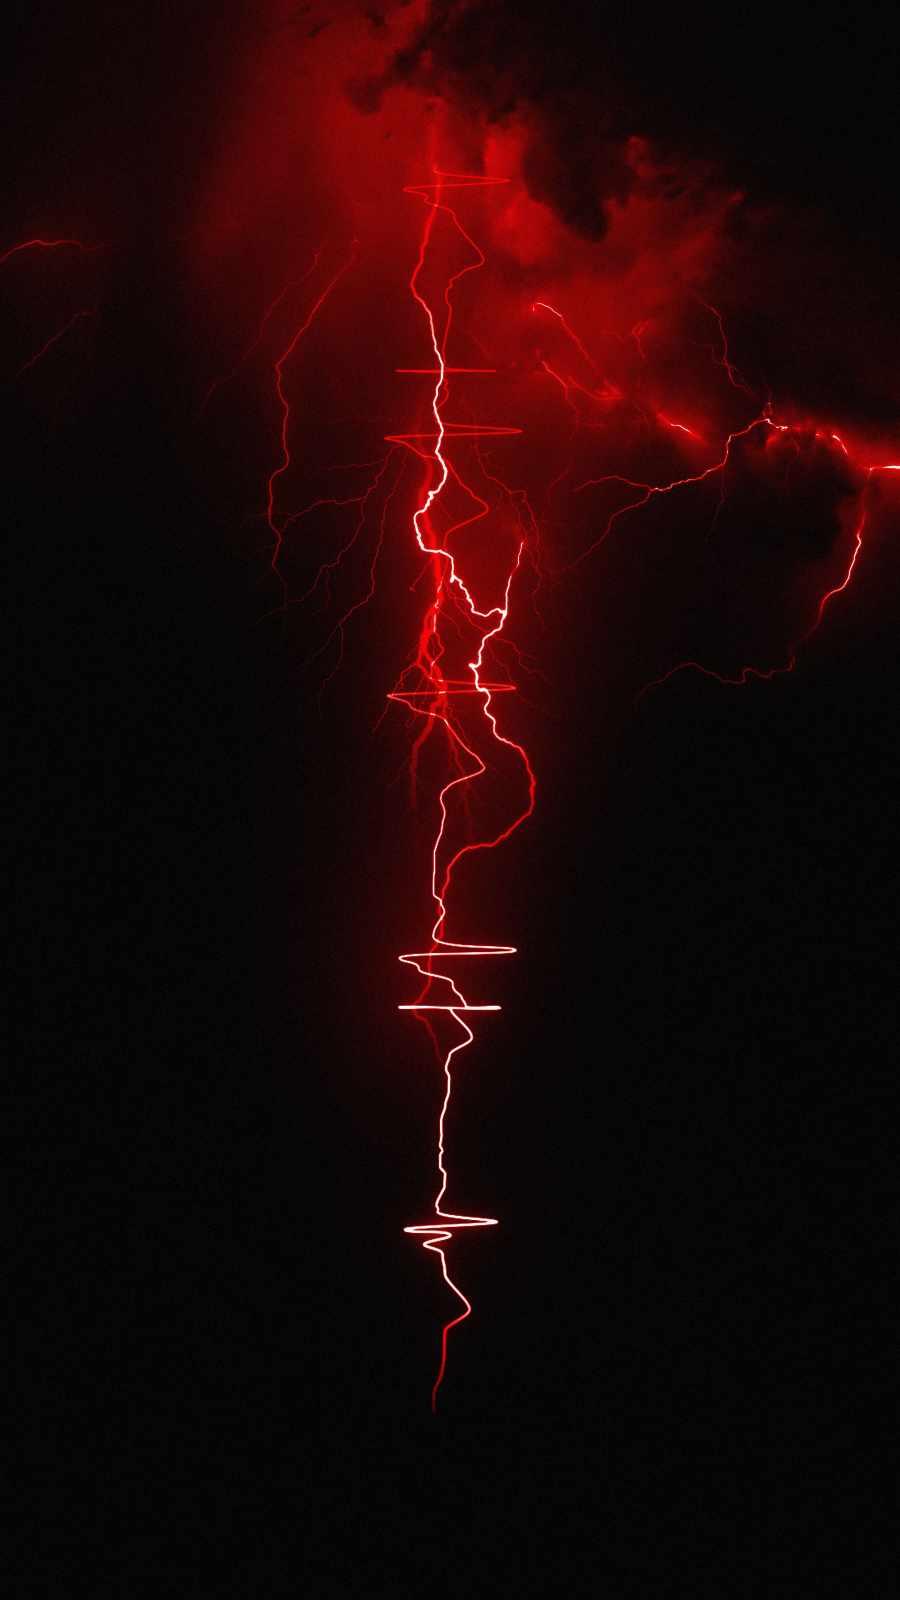 Thunder Beats iPhone Wallpaper